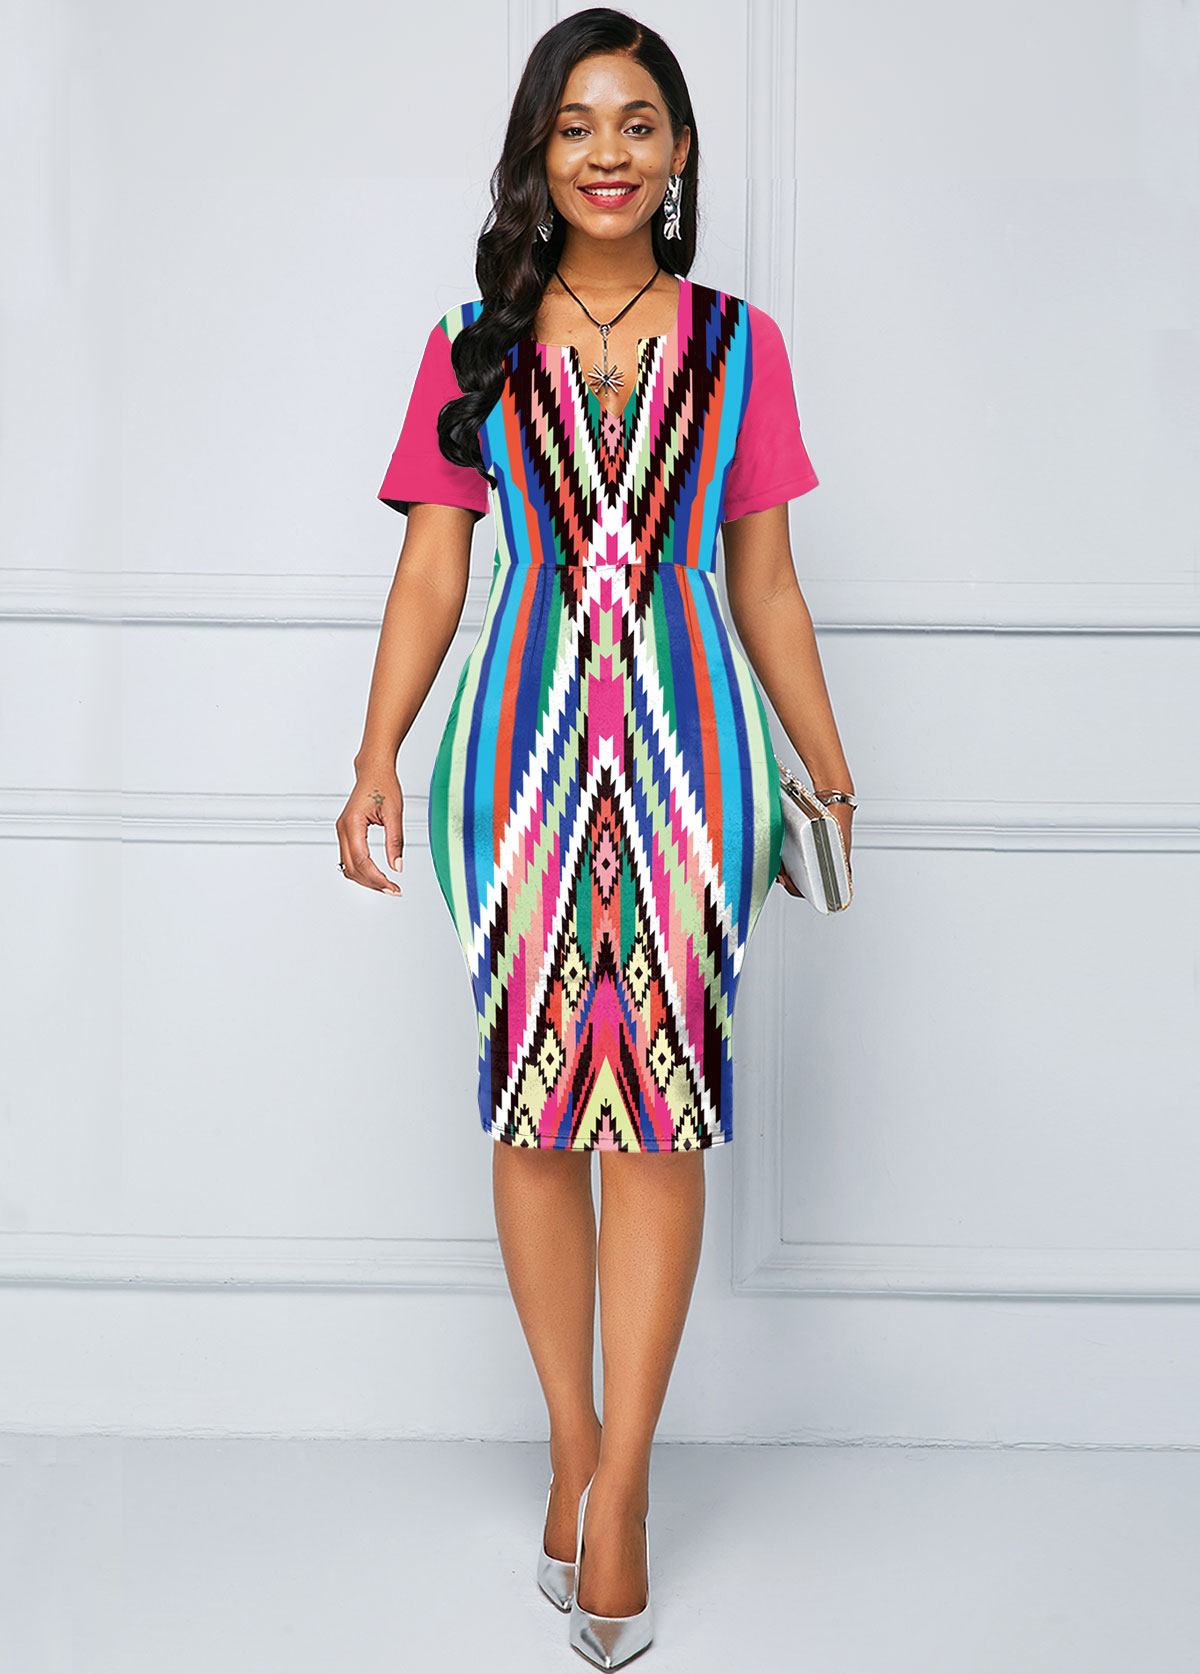 Short Sleeve Multi Color Geometric Print Dress